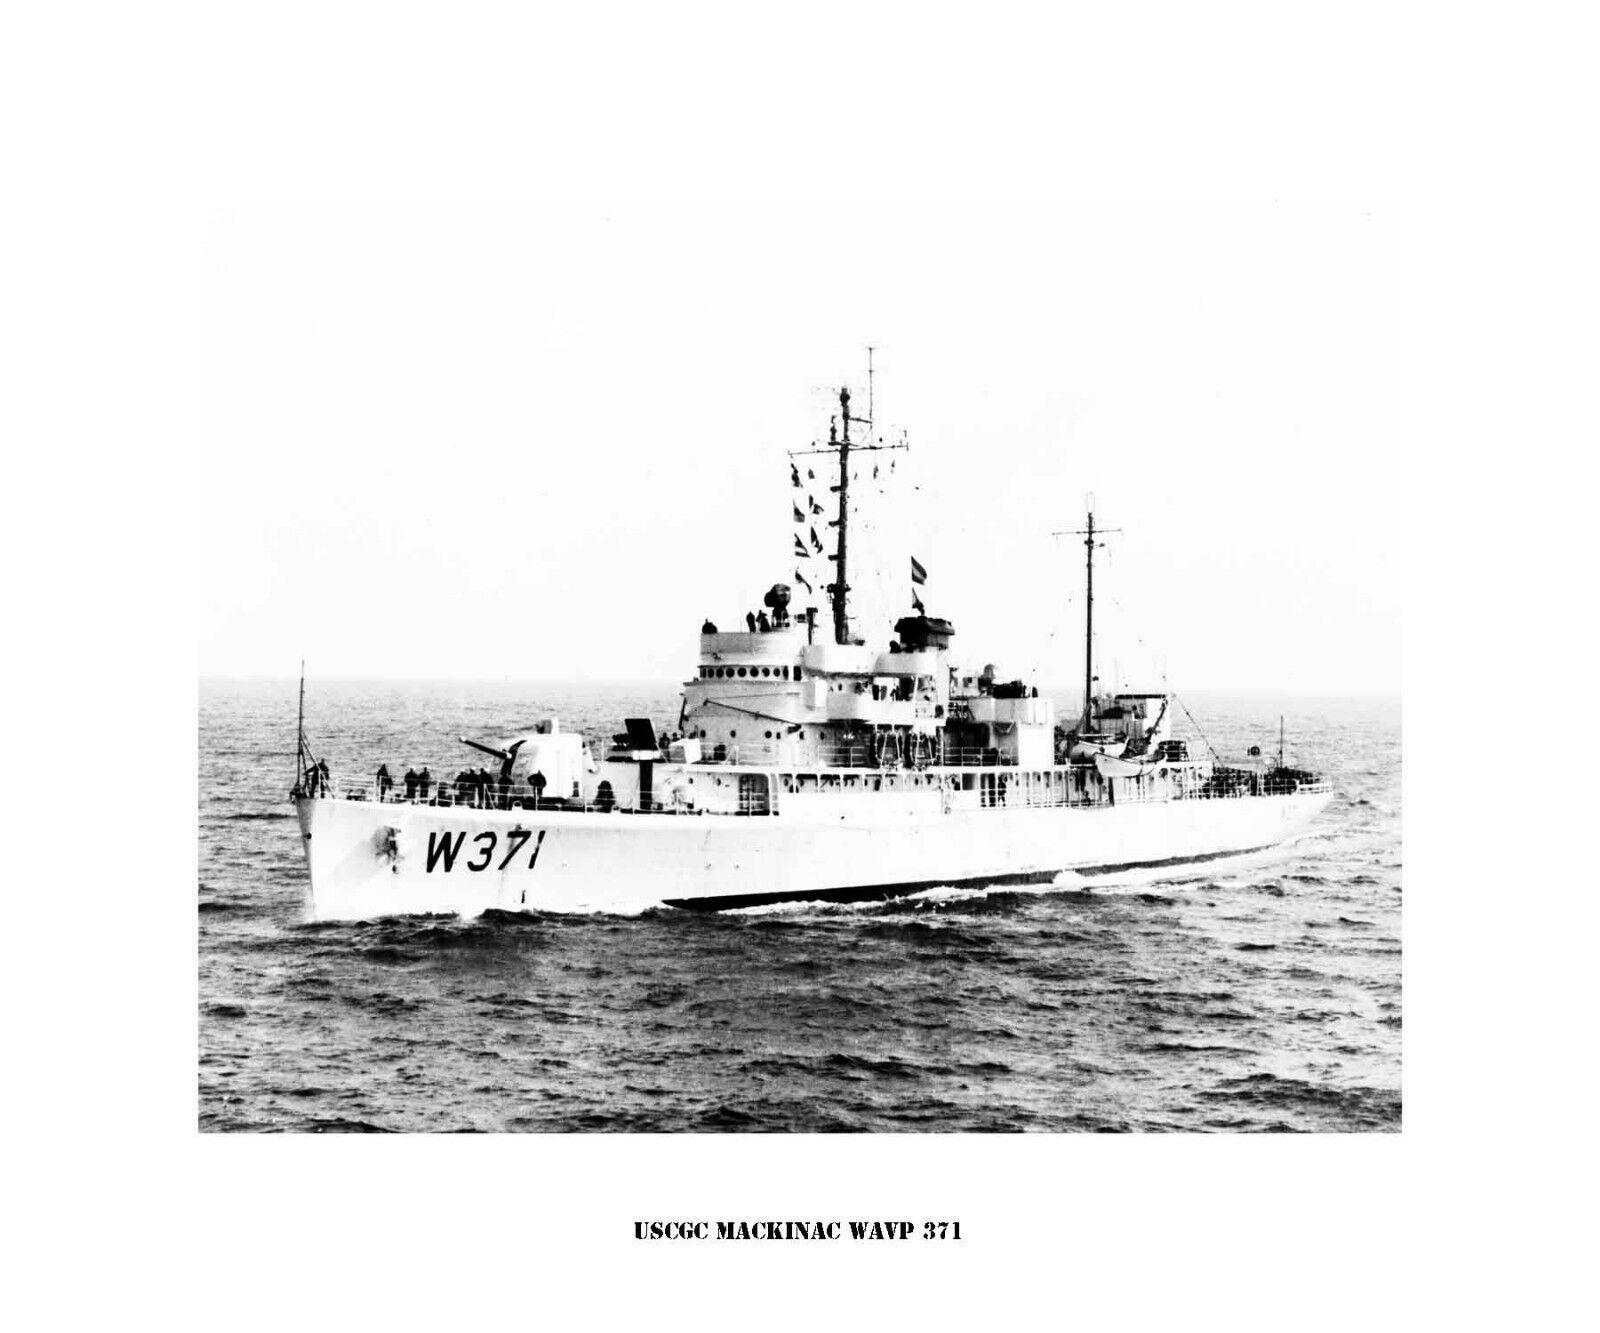 USCGC Mackinac WAVP 371  ---USCG, United States Coast Guard Ship Photo Print